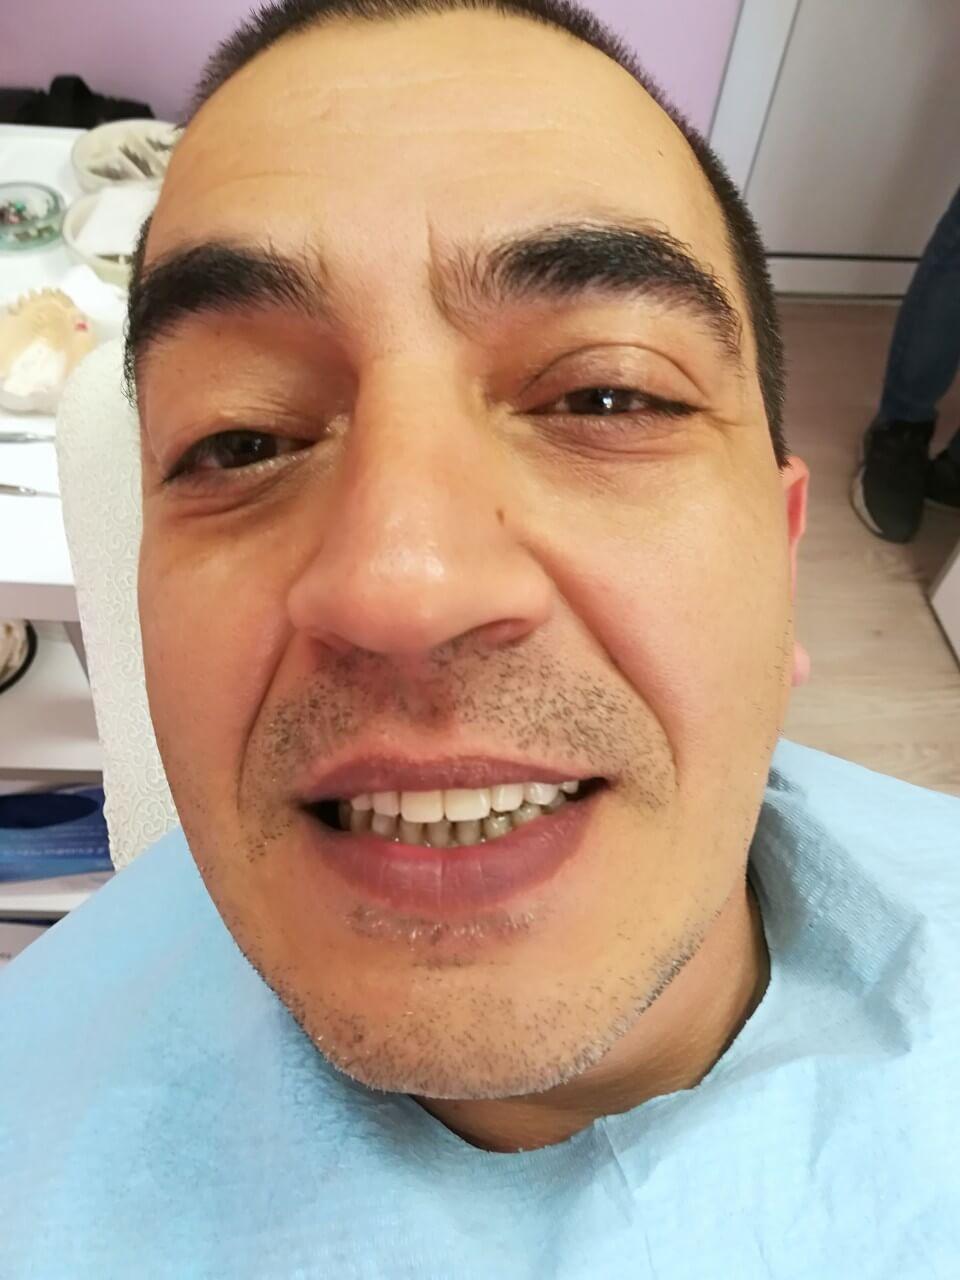 Зъбобол 【Причини и лекове】Поставяне на зъбни импанти- Медика 3 Дент